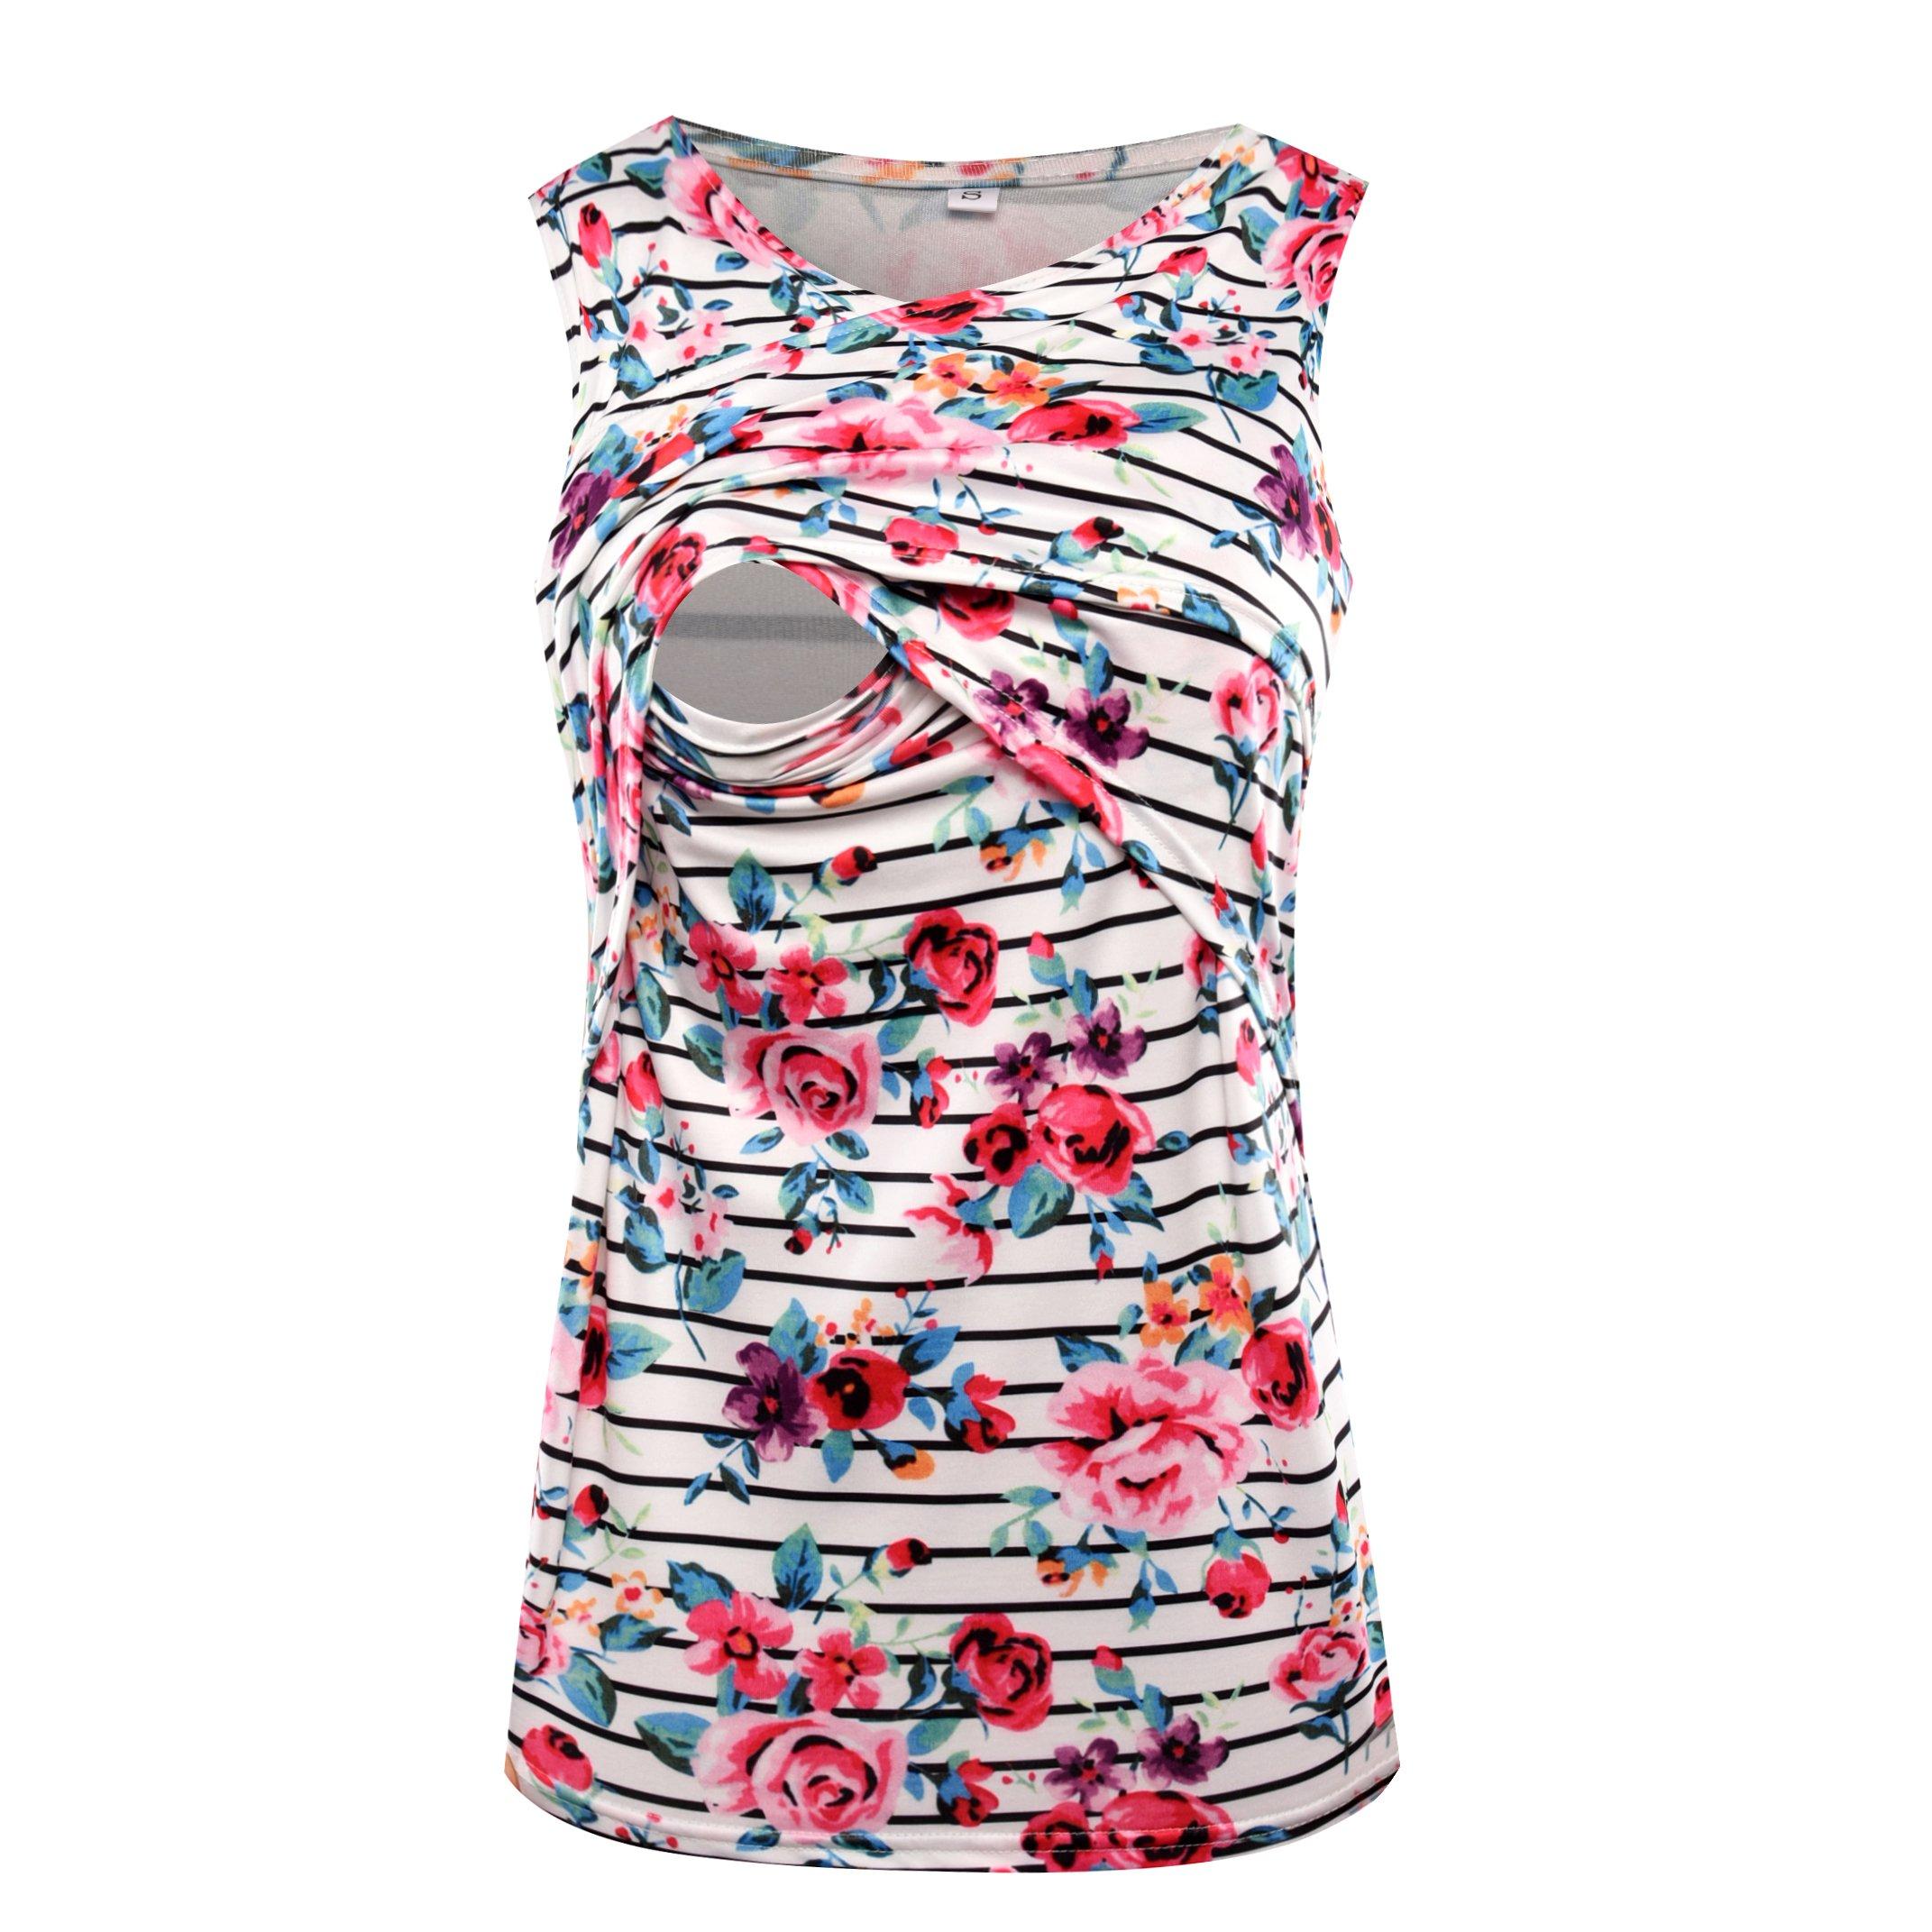 Women's Sleeveless Maternity Breastfeeding and Nursing Tank Top Cami Vest (L, White)